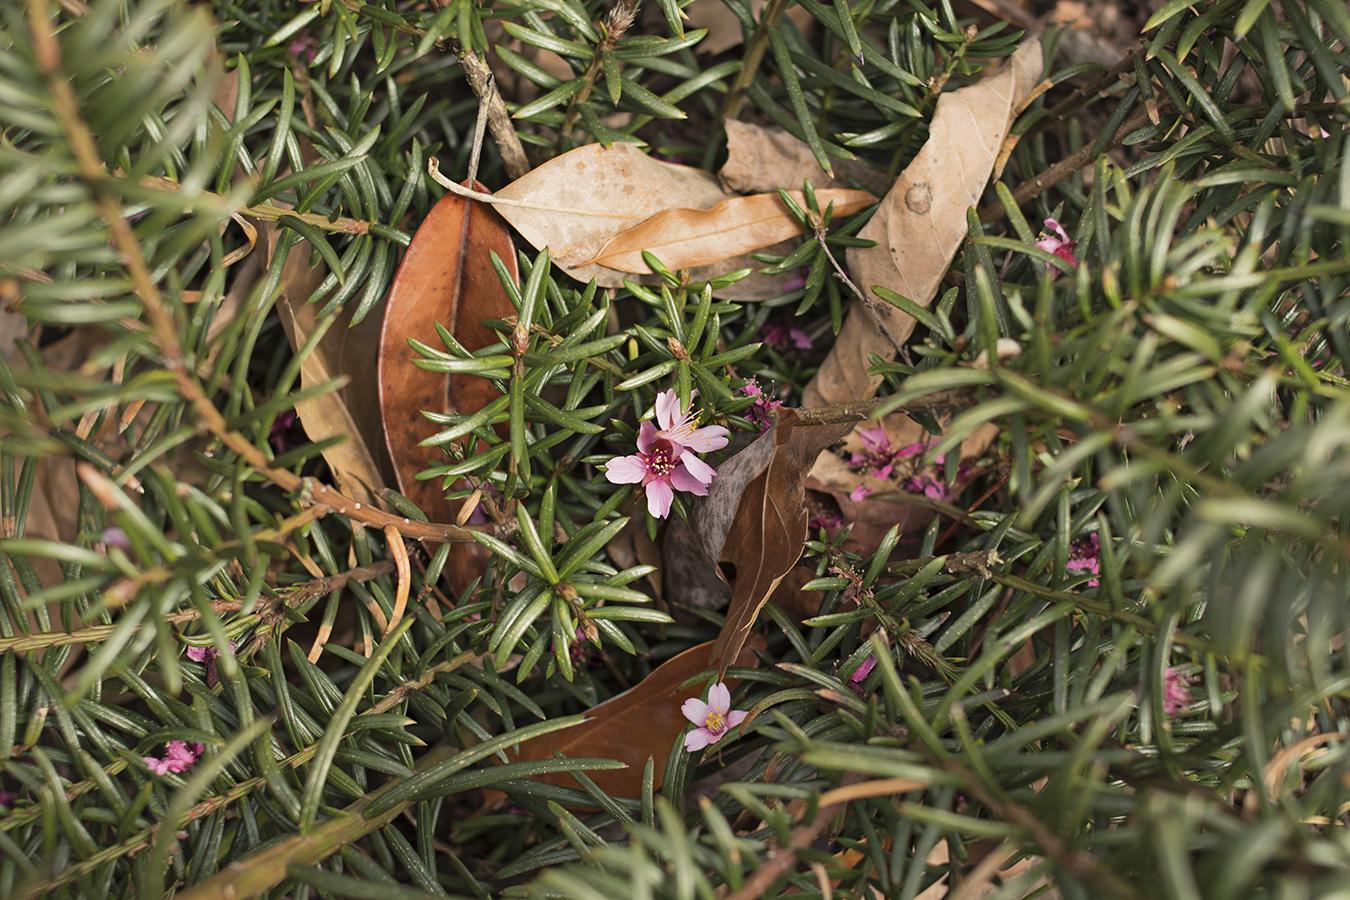 Eileen_Ko_Assignment_4_Pink_Flower_In_Bush_Brown_Leaves